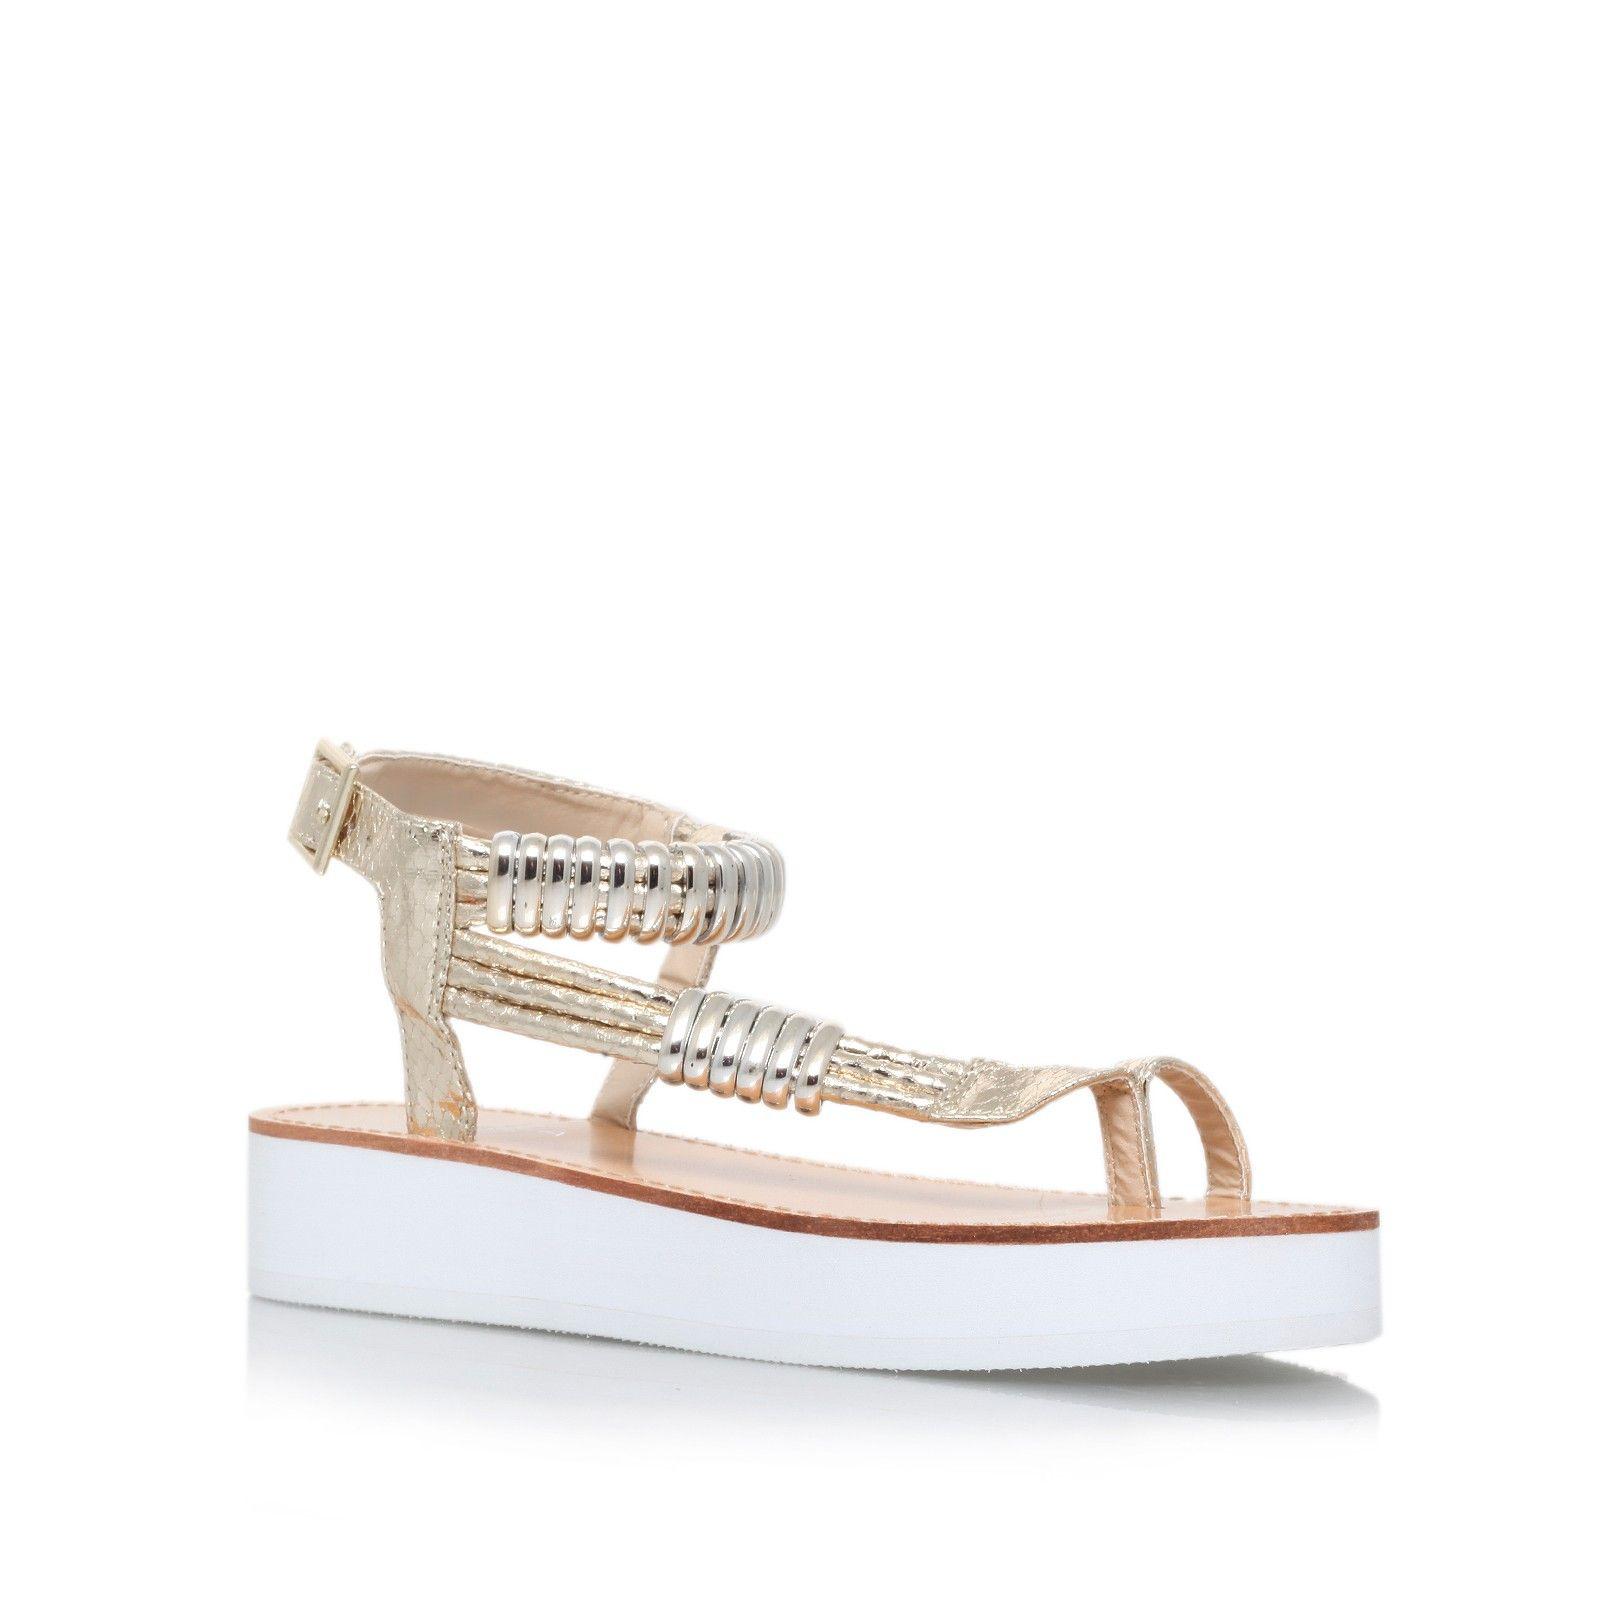 9b11912c48b0 klip gold flat sandals from Carvela Kurt Geiger